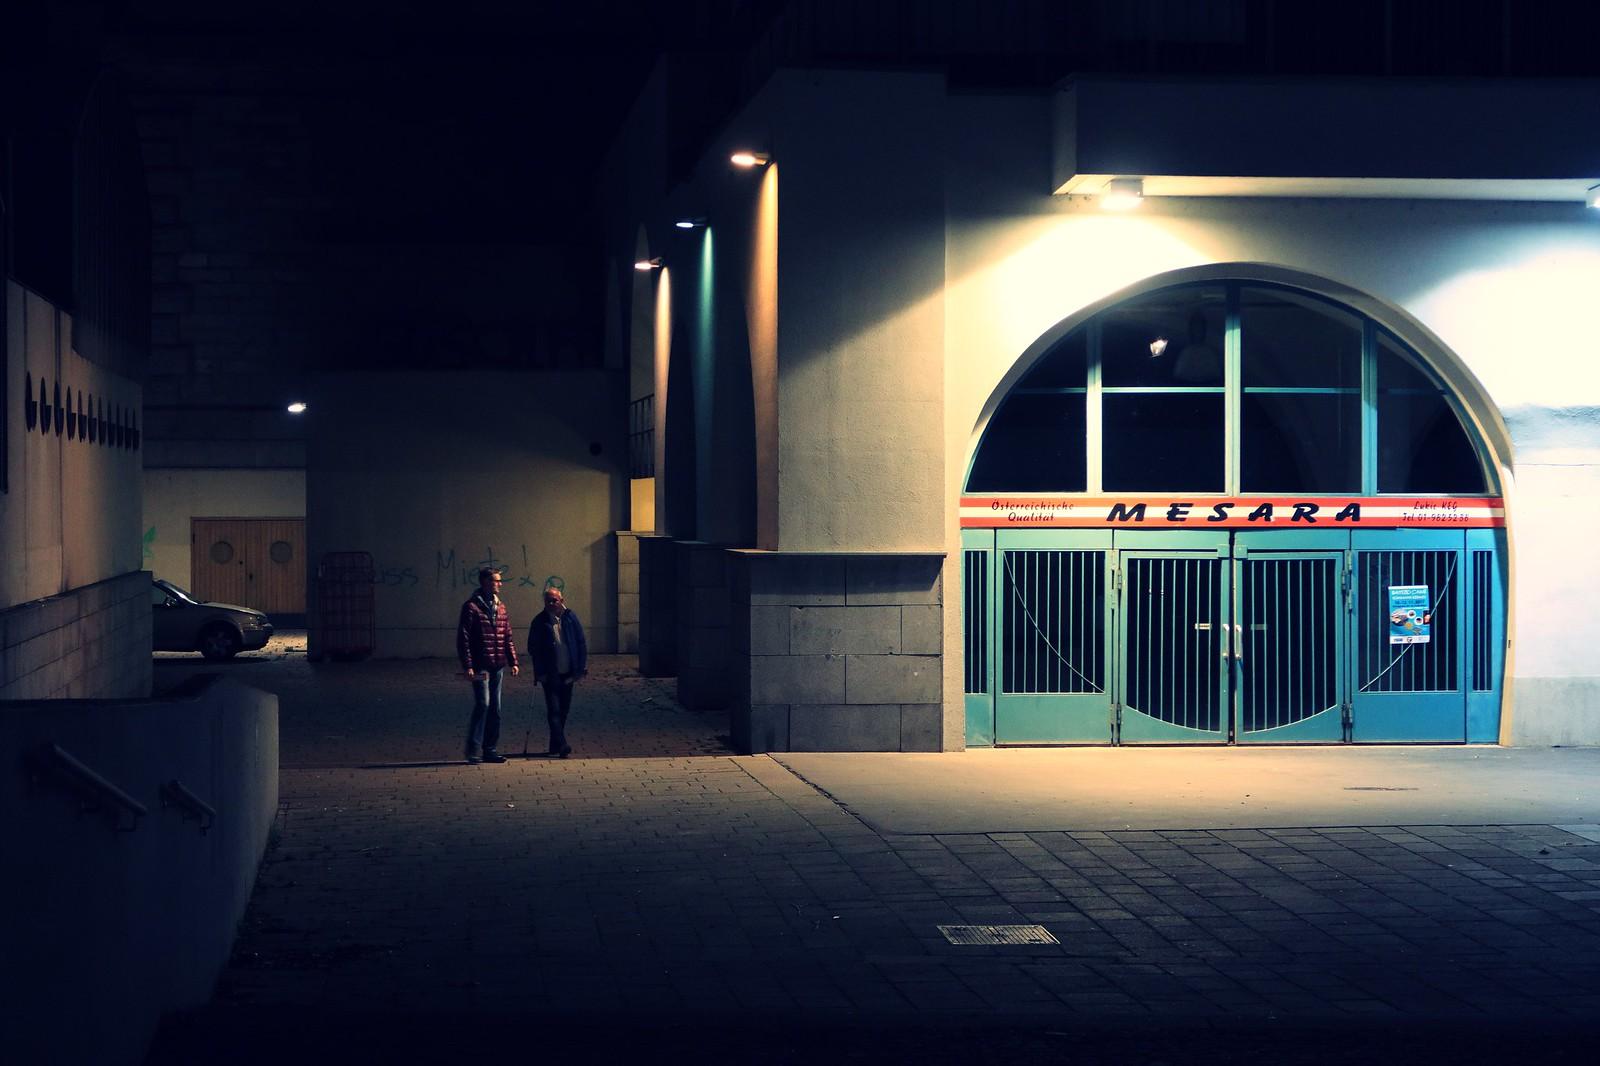 Mesara | by No_Mosquito